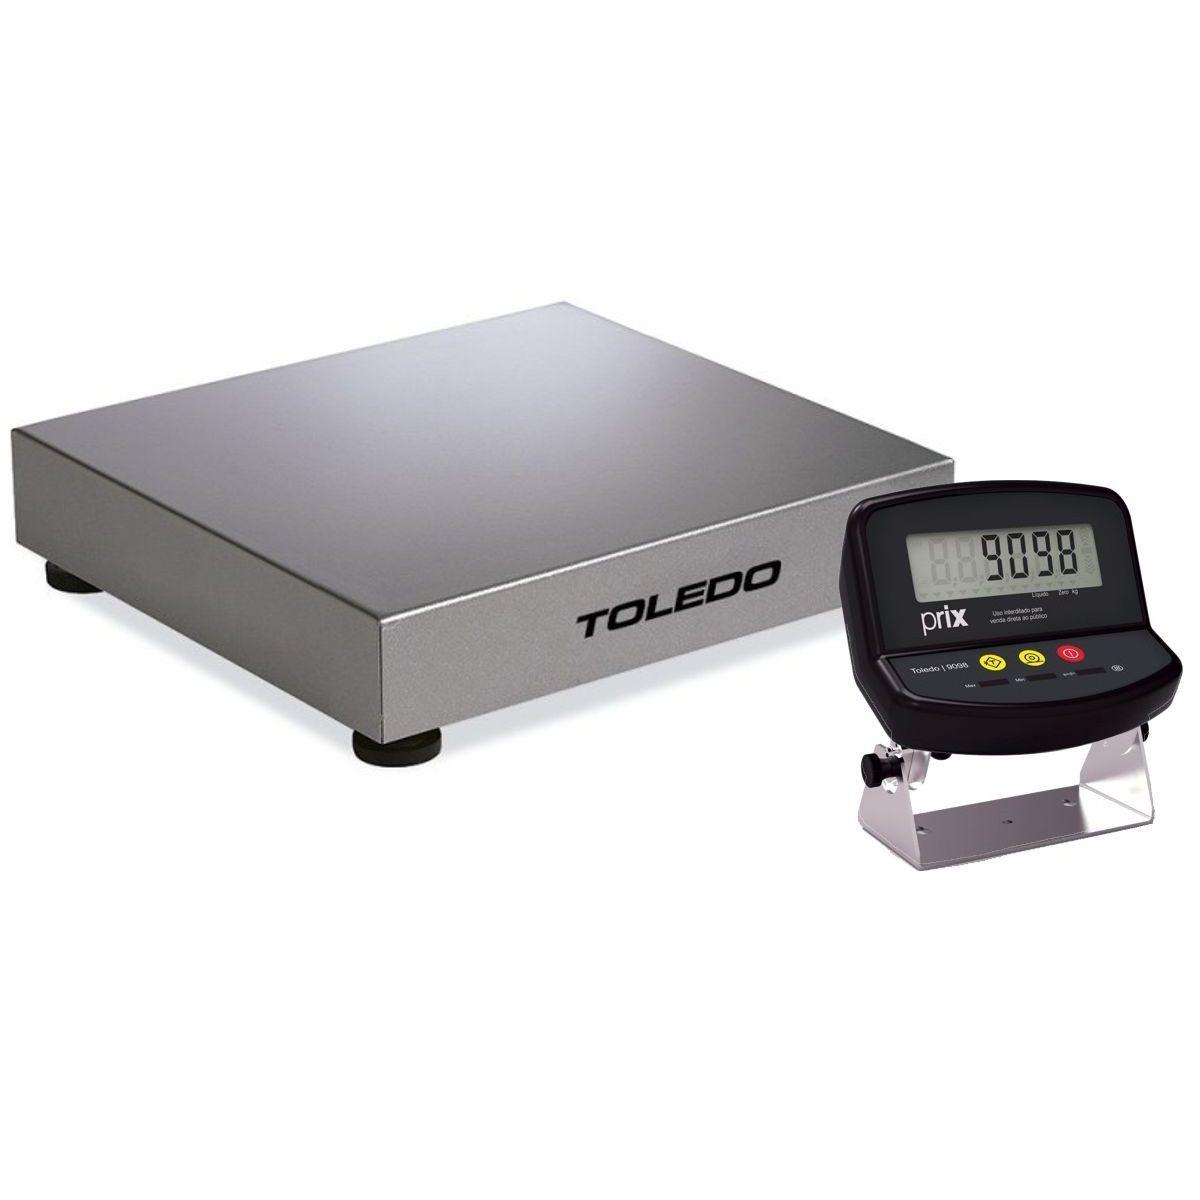 Balança de Piso Toledo 2098 (30Kgx5g) (37,5x42,5cm)